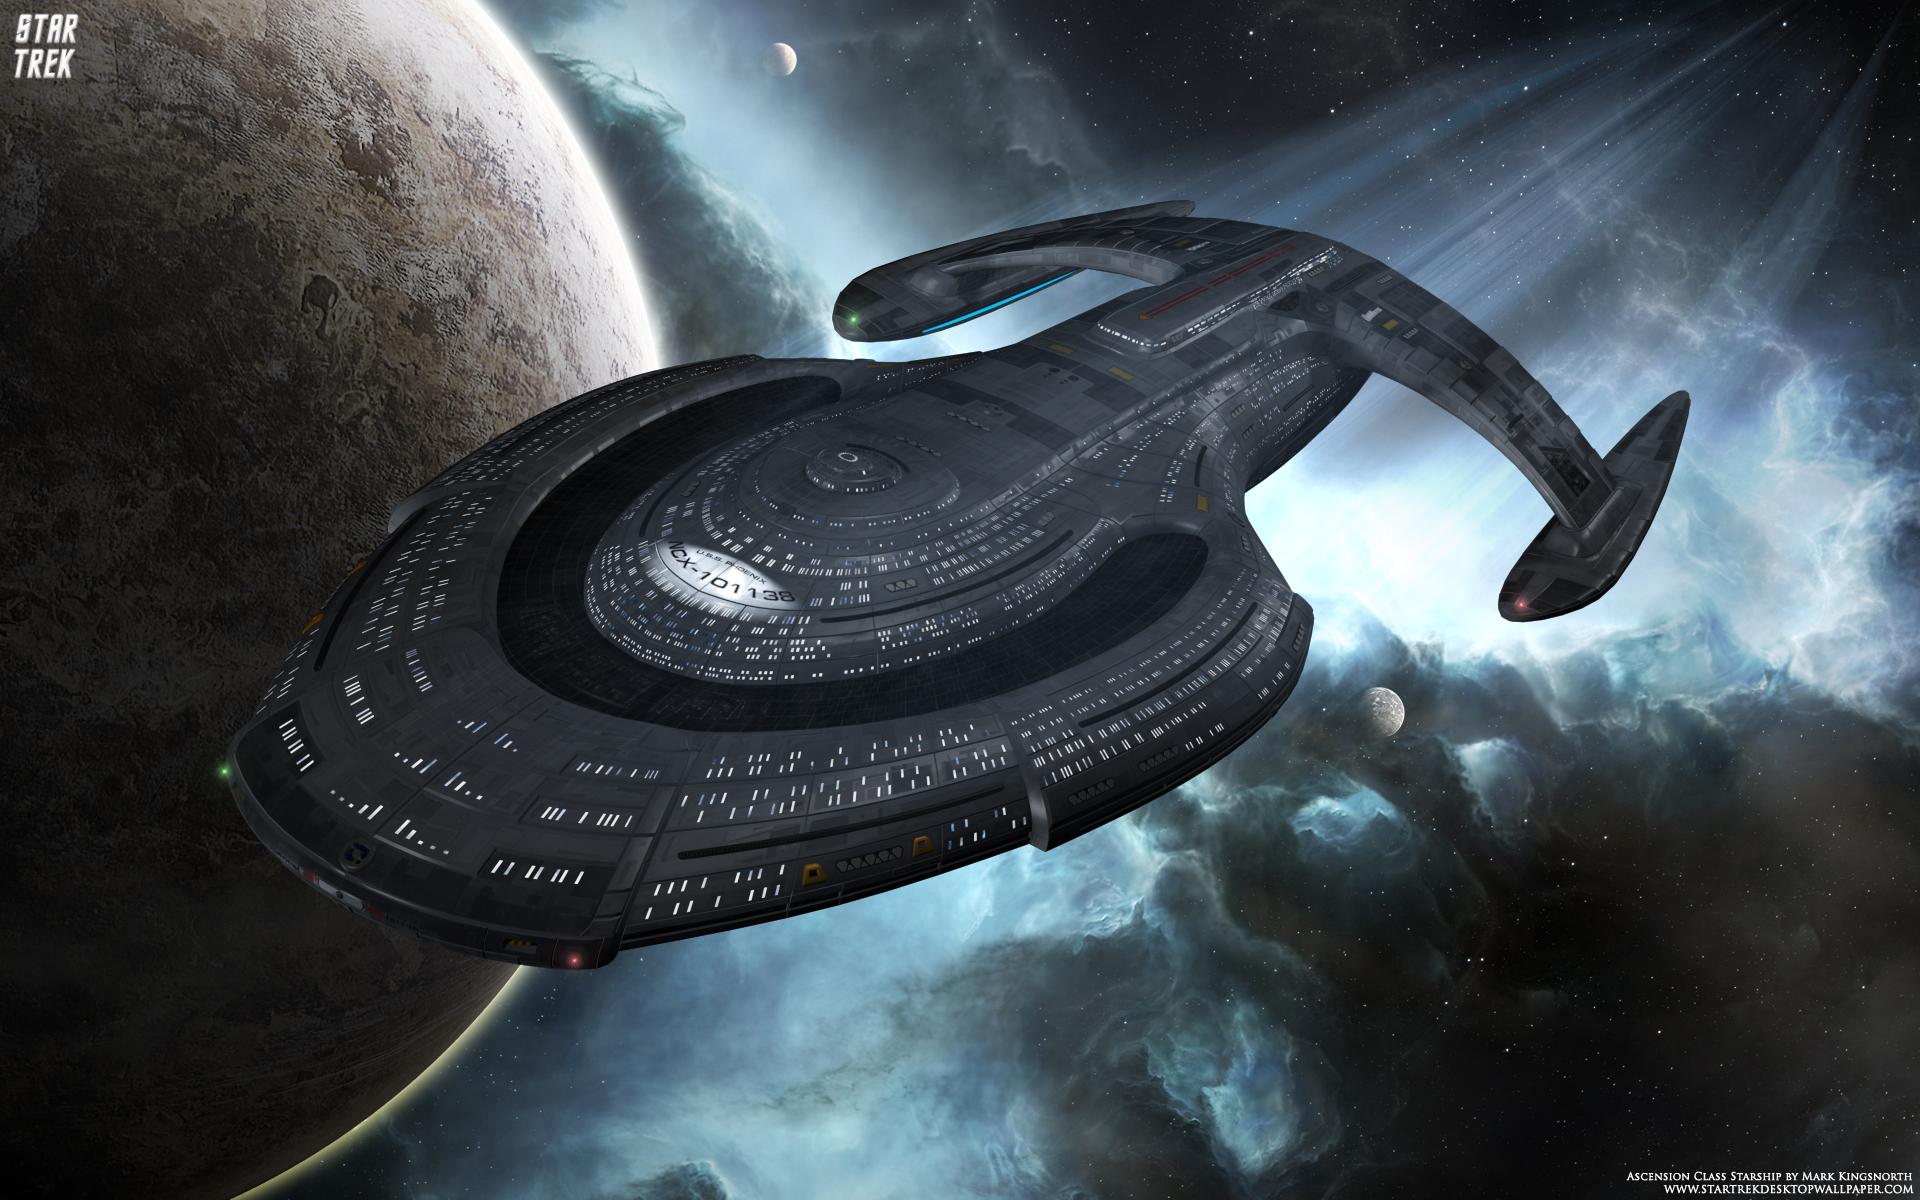 Starship Star Trek computer desktop wallpaper pictures images 1920x1200